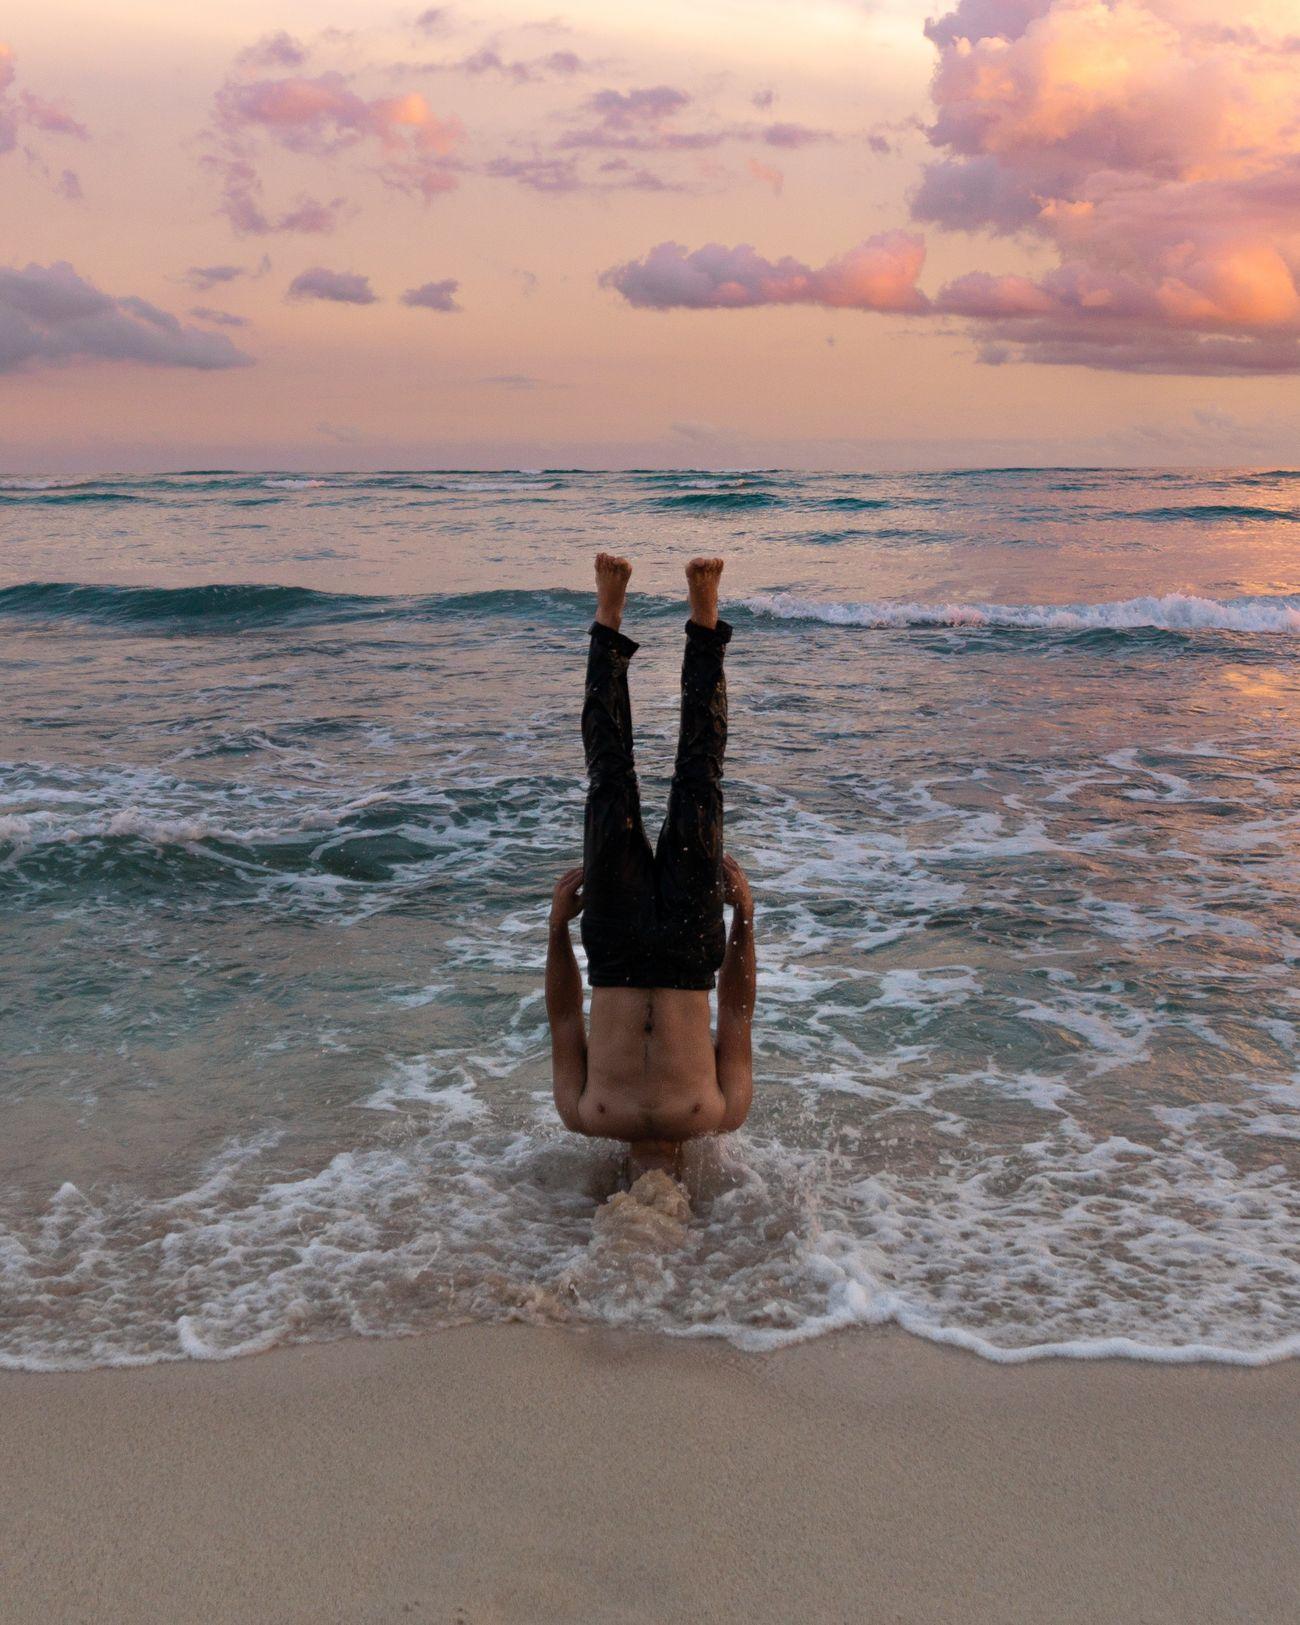 sea, sky, water, sunset, beach